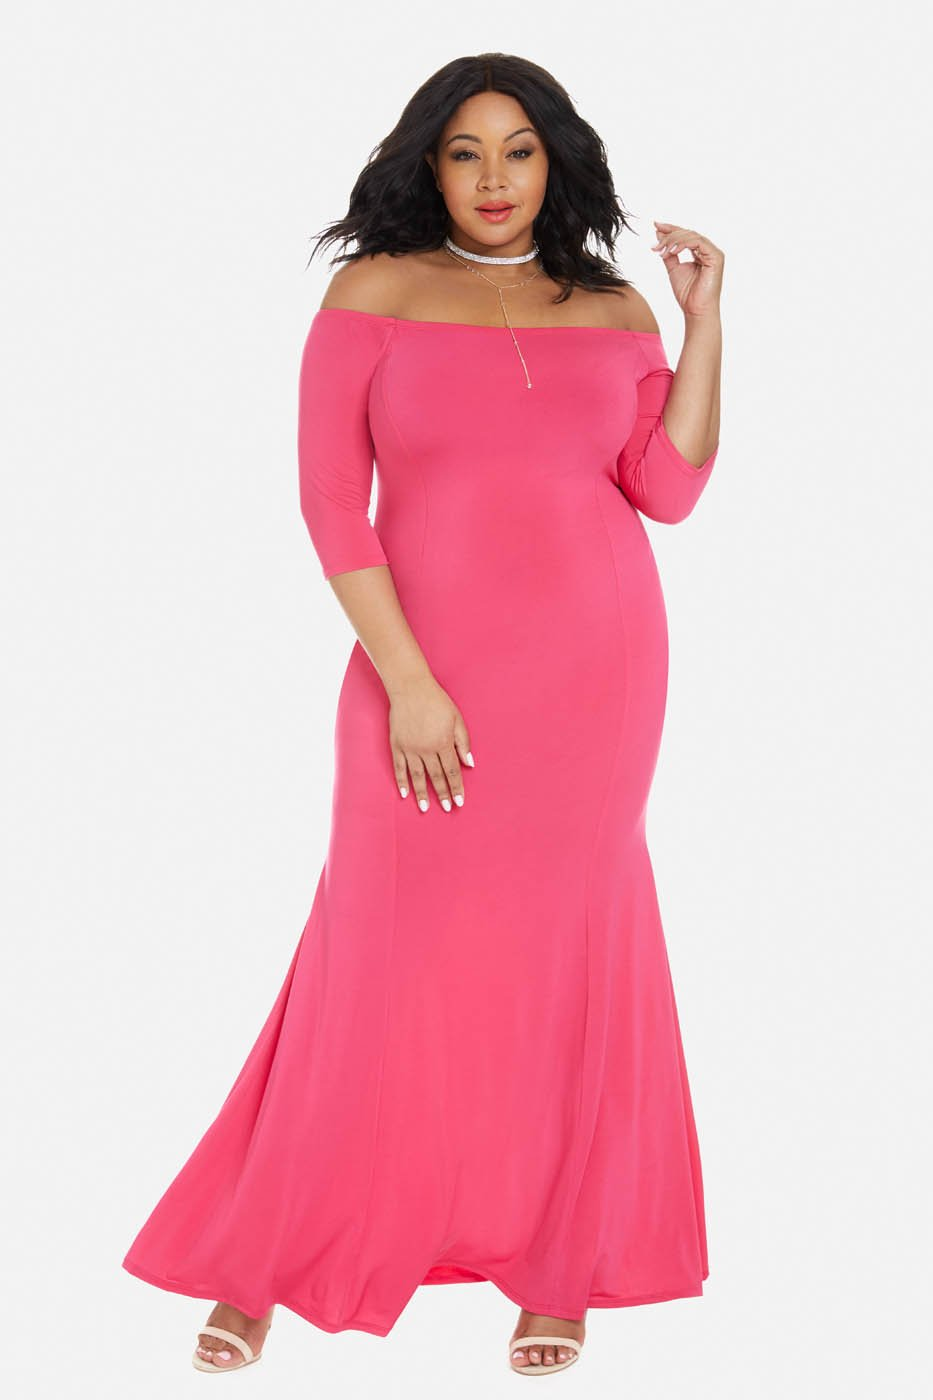 Womens Plus Size Clothing Fashion 19